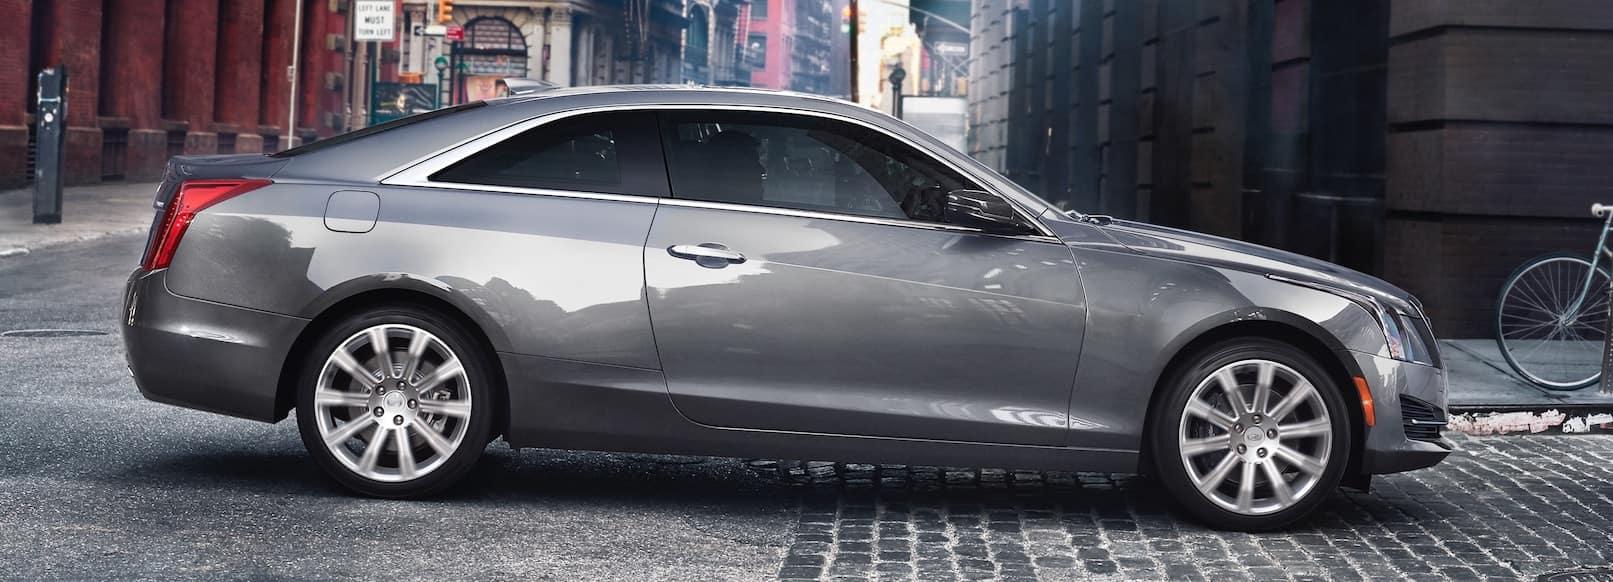 Cadillac ATS Dealership